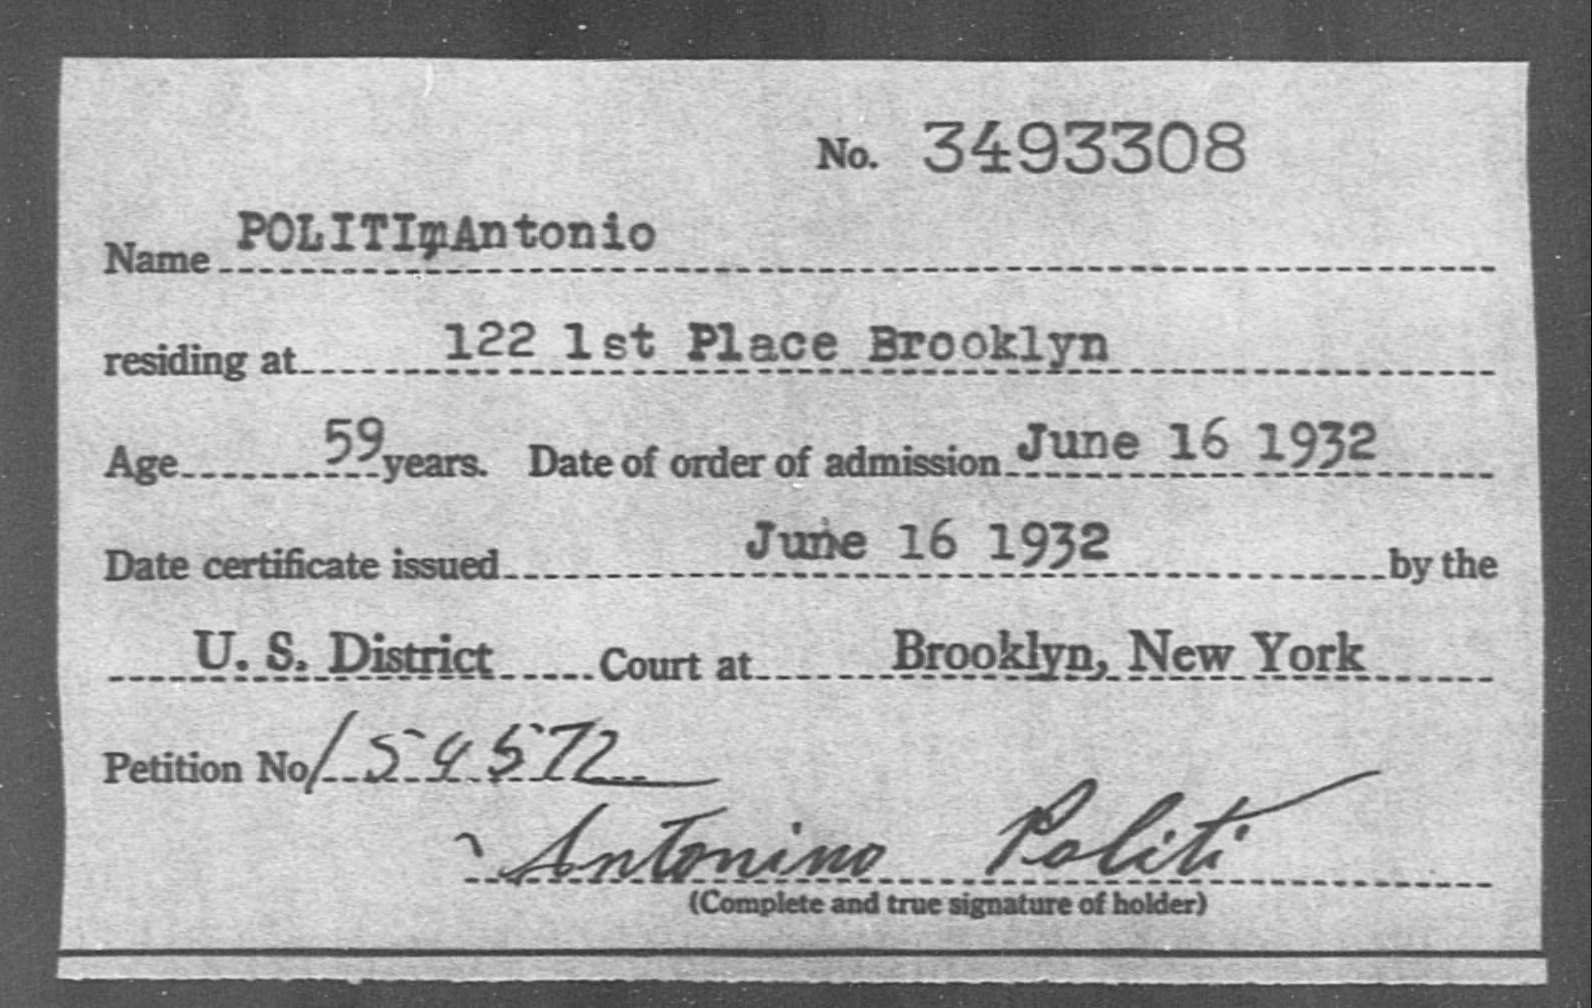 POLITI, Antonio - Born: [BLANK], Naturalized: 1932